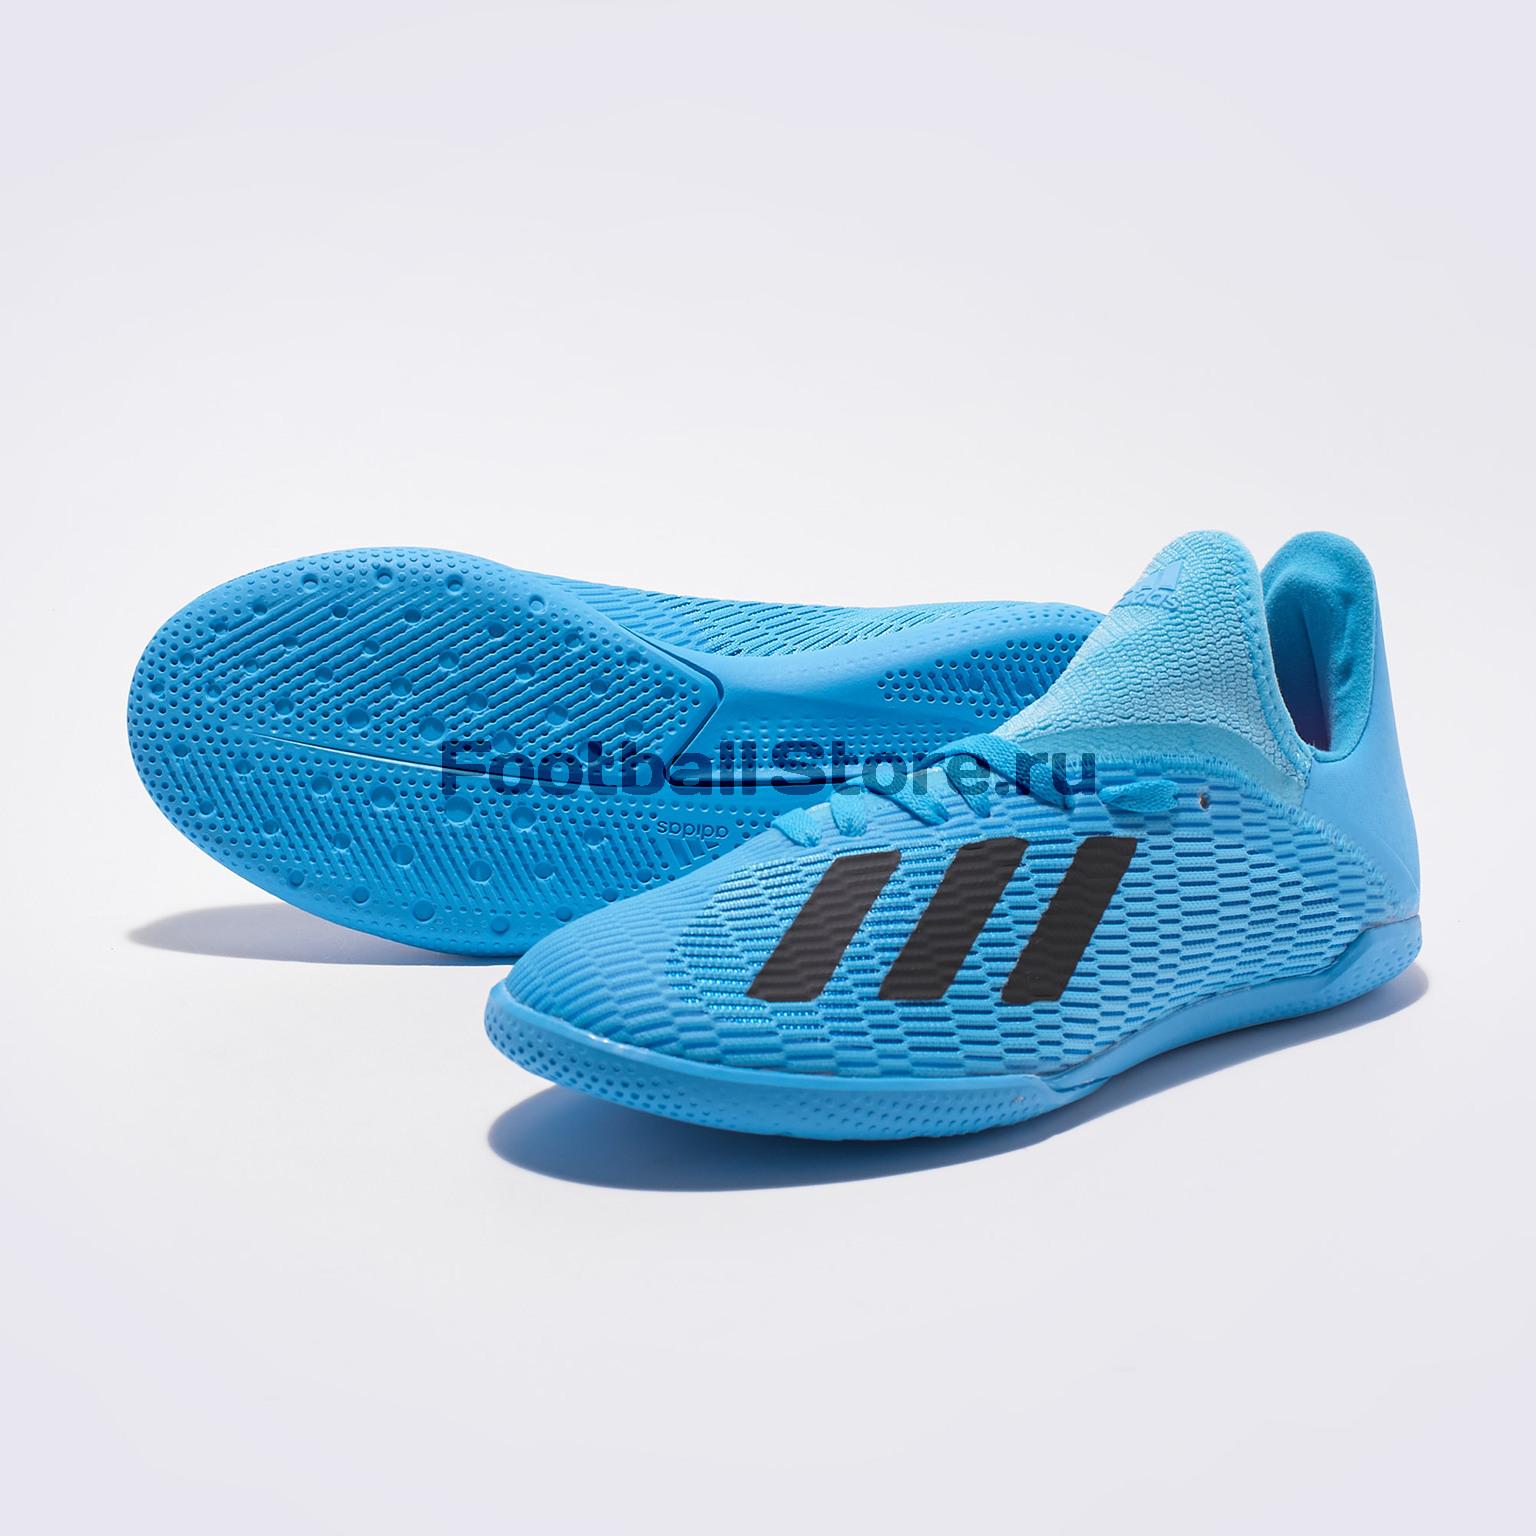 Футзалки детские Adidas X 19.3 IN F35354